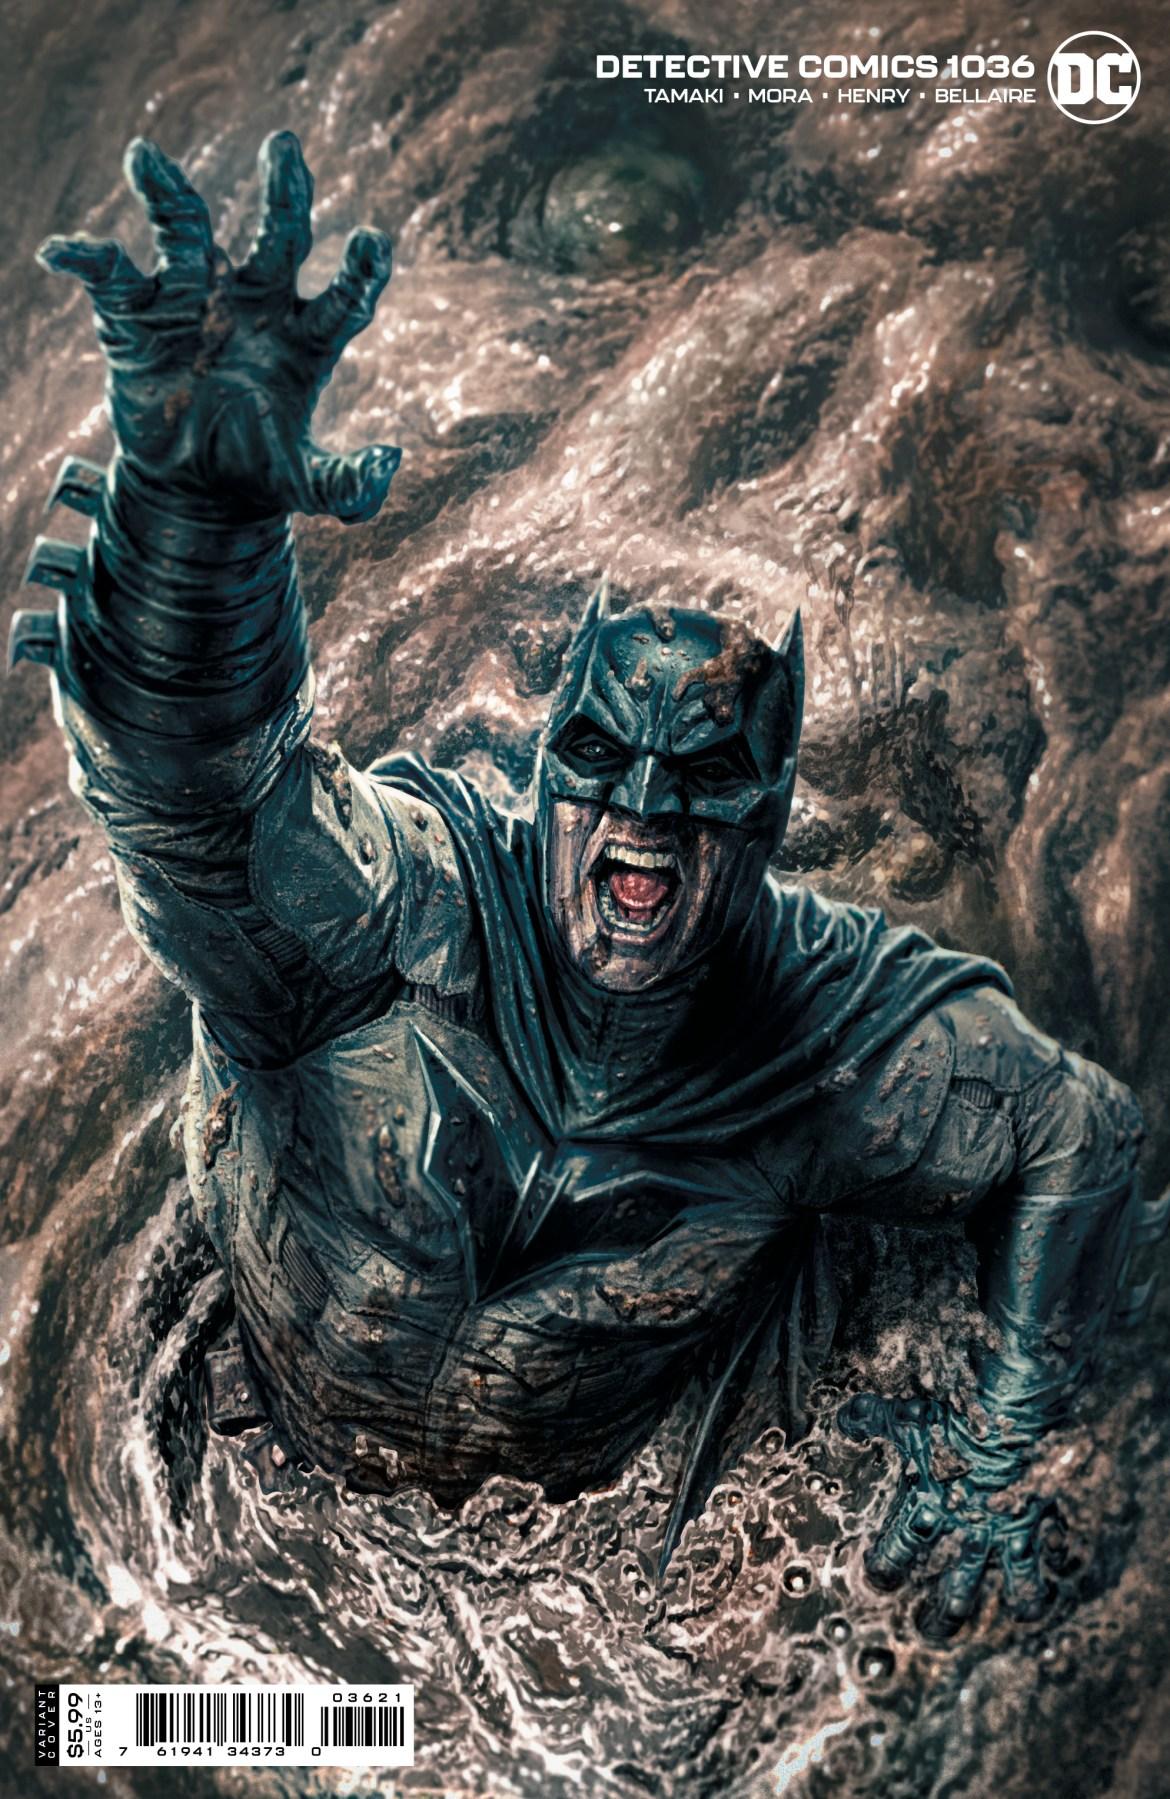 0321DC058 ComicList: DC Comics New Releases for 05/26/2021